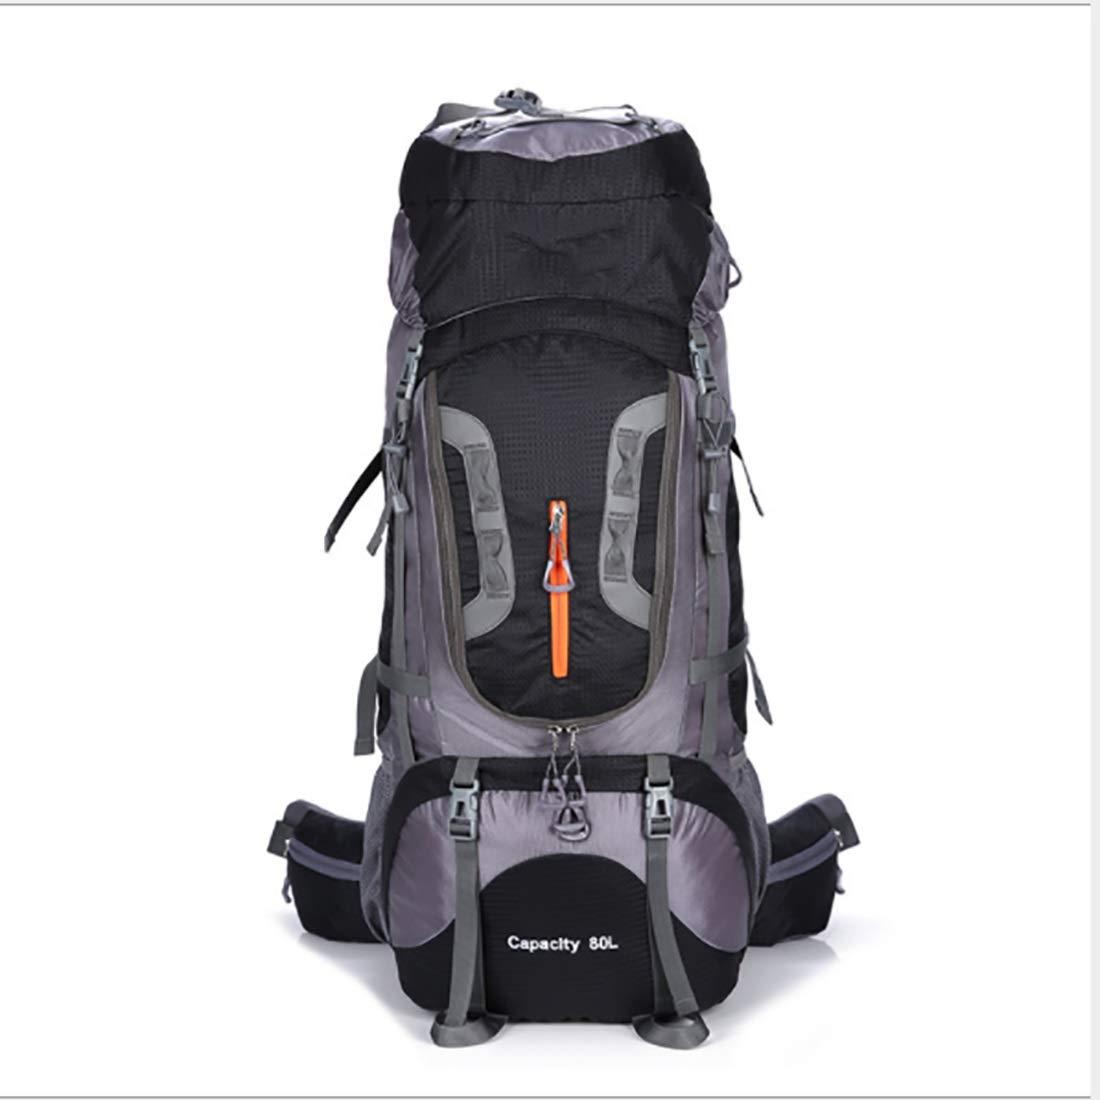 CeSuoLBD 登山バックパック防水ナイロン多機能調節可能なピギーバック旅行野生キャンプレジャースポーツニュートラルショルダー屋外での使用に適して (Color : ブラック) B07NP9XC13 ブラック